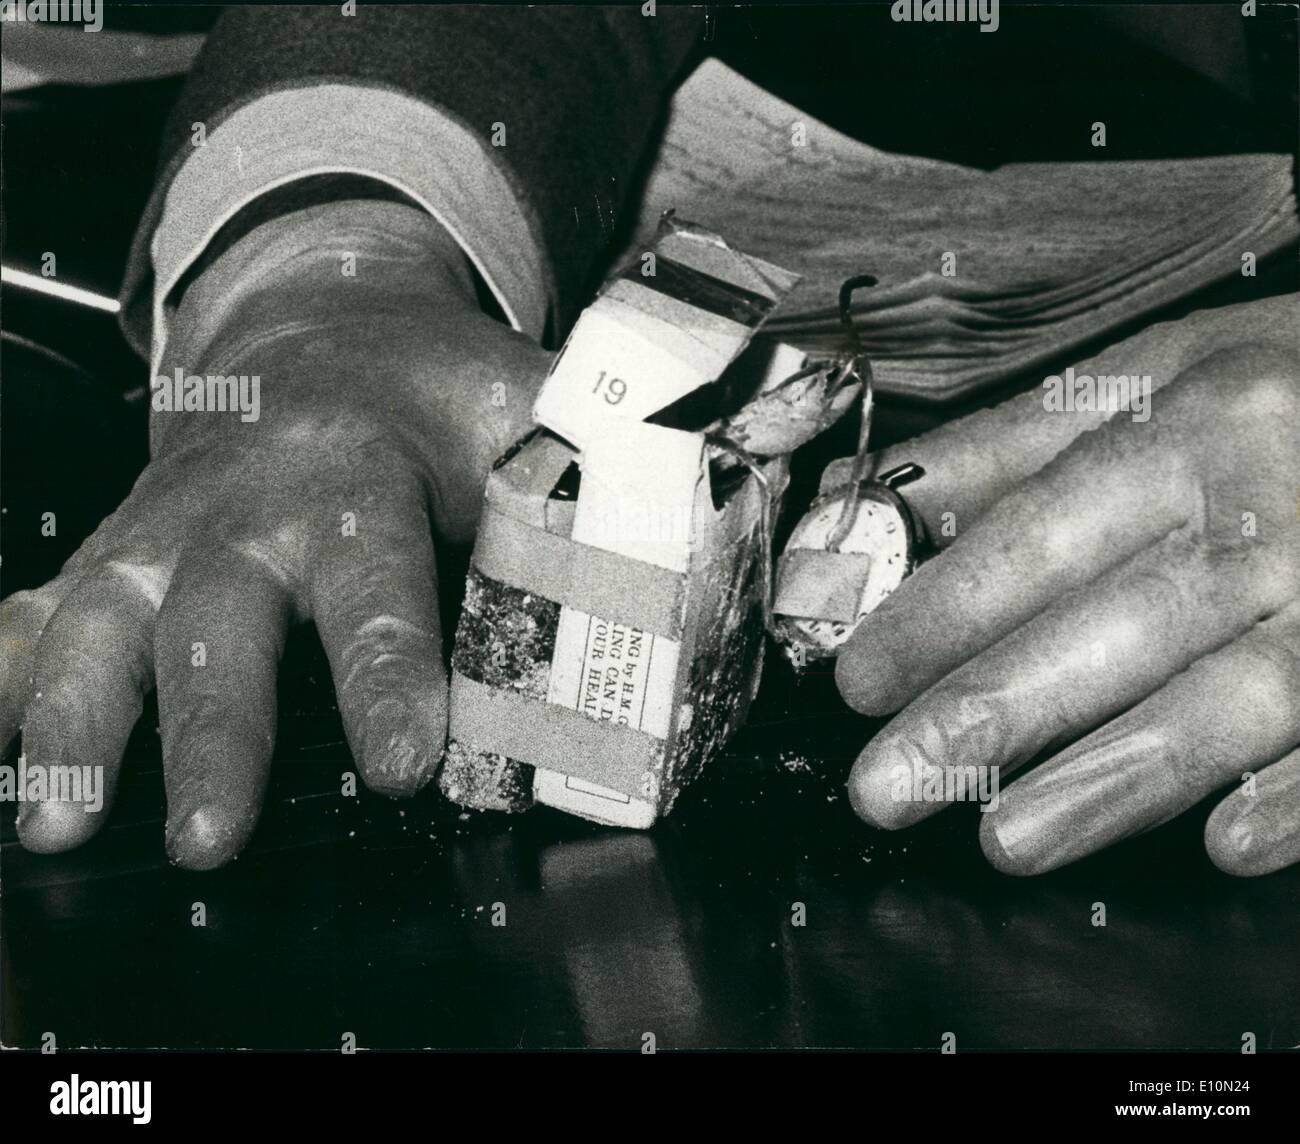 Cigarette Packet Stockfotos & Cigarette Packet Bilder - Seite 26 - Alamy